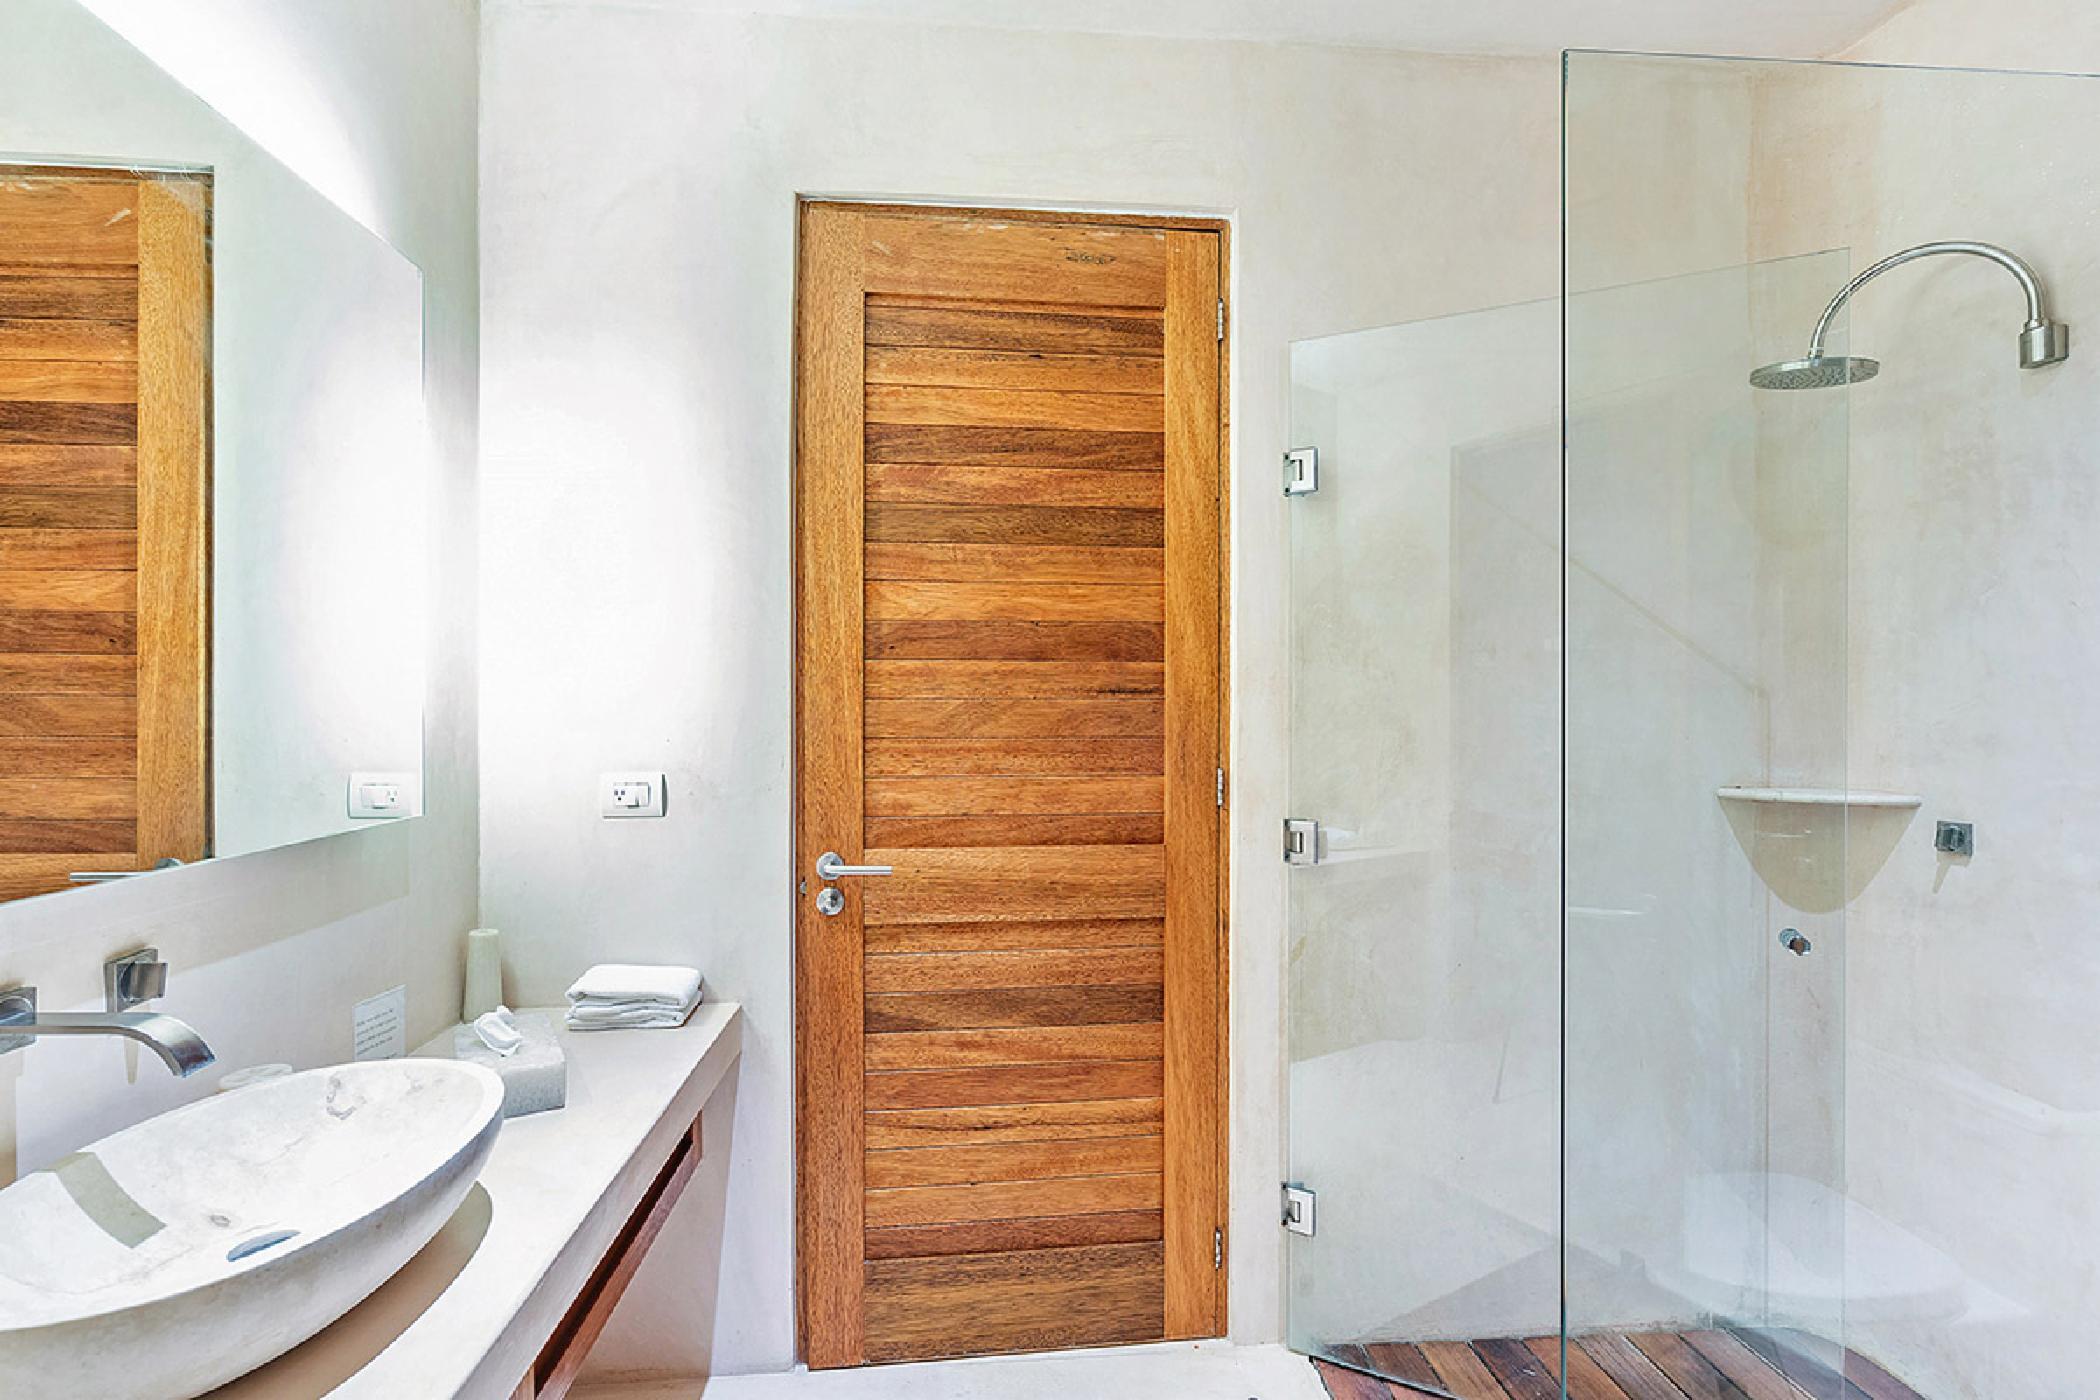 Maya_Luxe_Riviera_Maya_Luxury_Villas_Experiences_Sian_Kaan_Tulum_4_Bedrooms_Casa_Cantarena_29.jpg